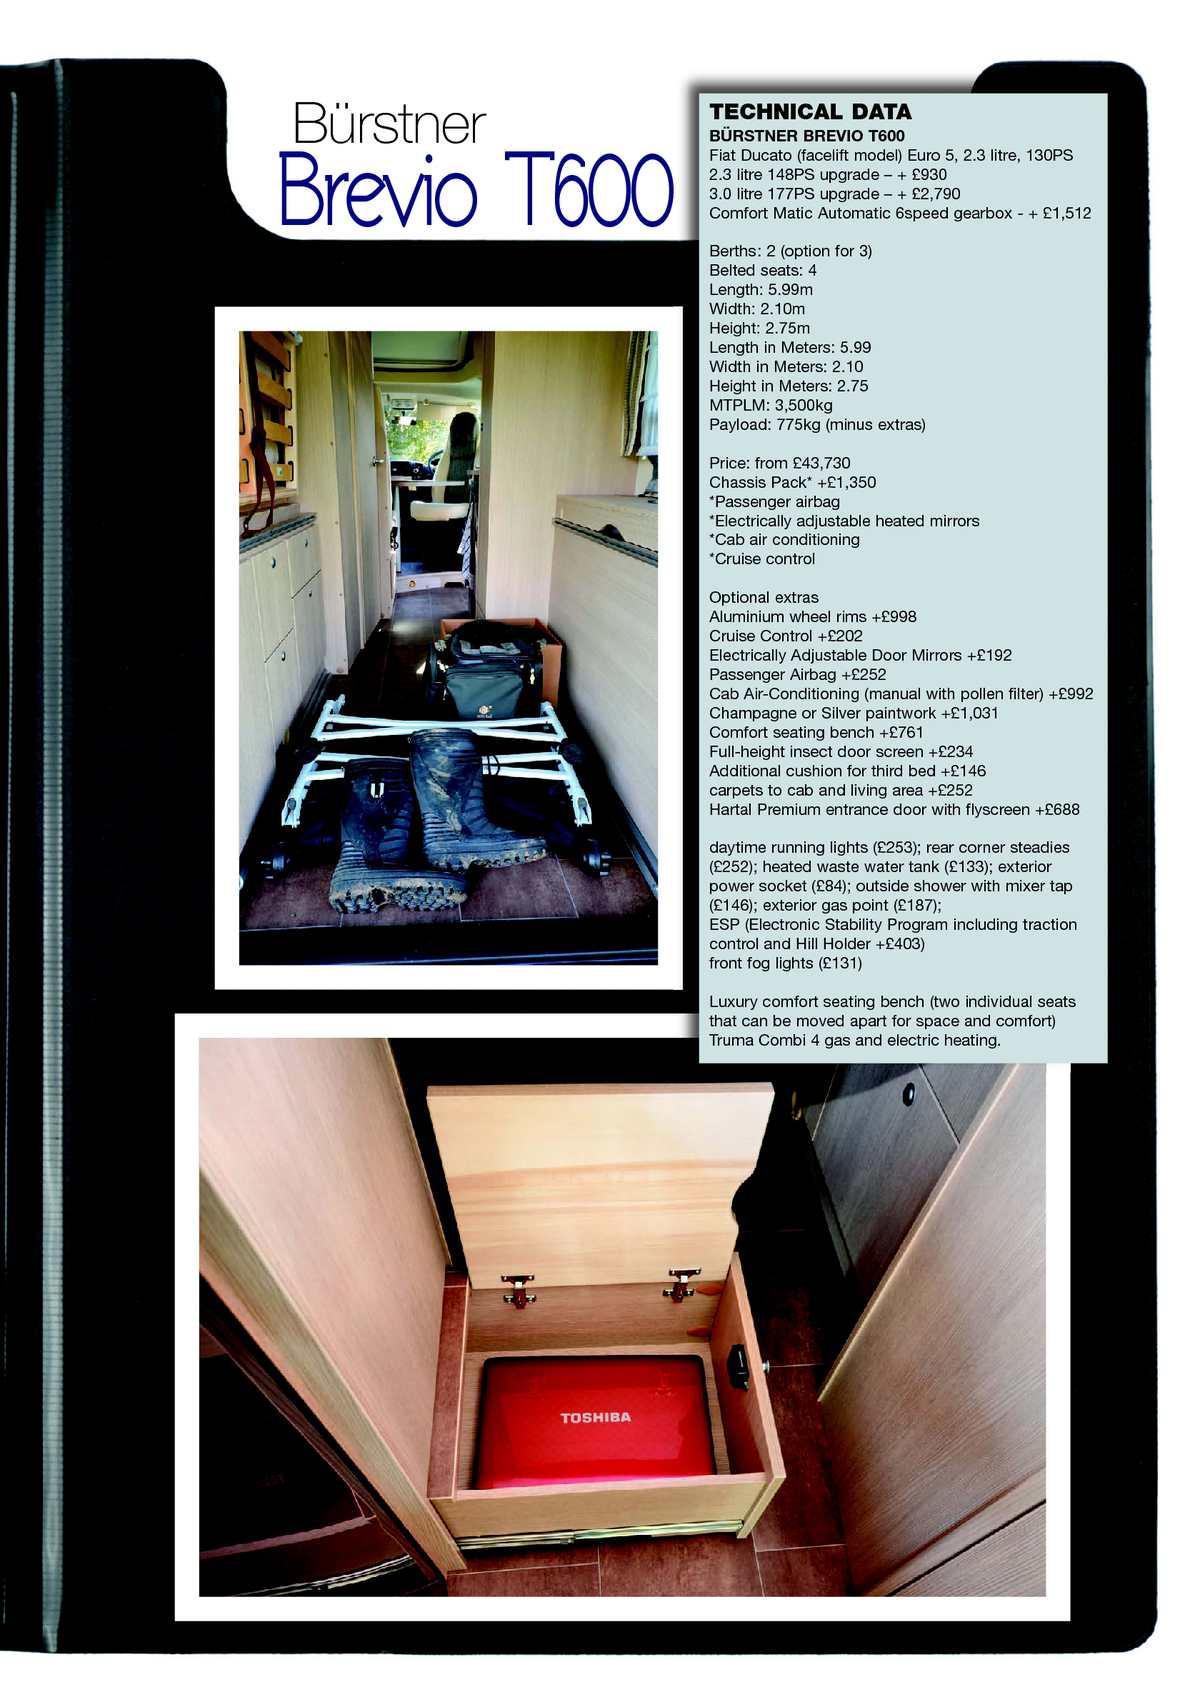 Feb 2013 motorhome campervan calameo downloader page 47 fandeluxe Gallery